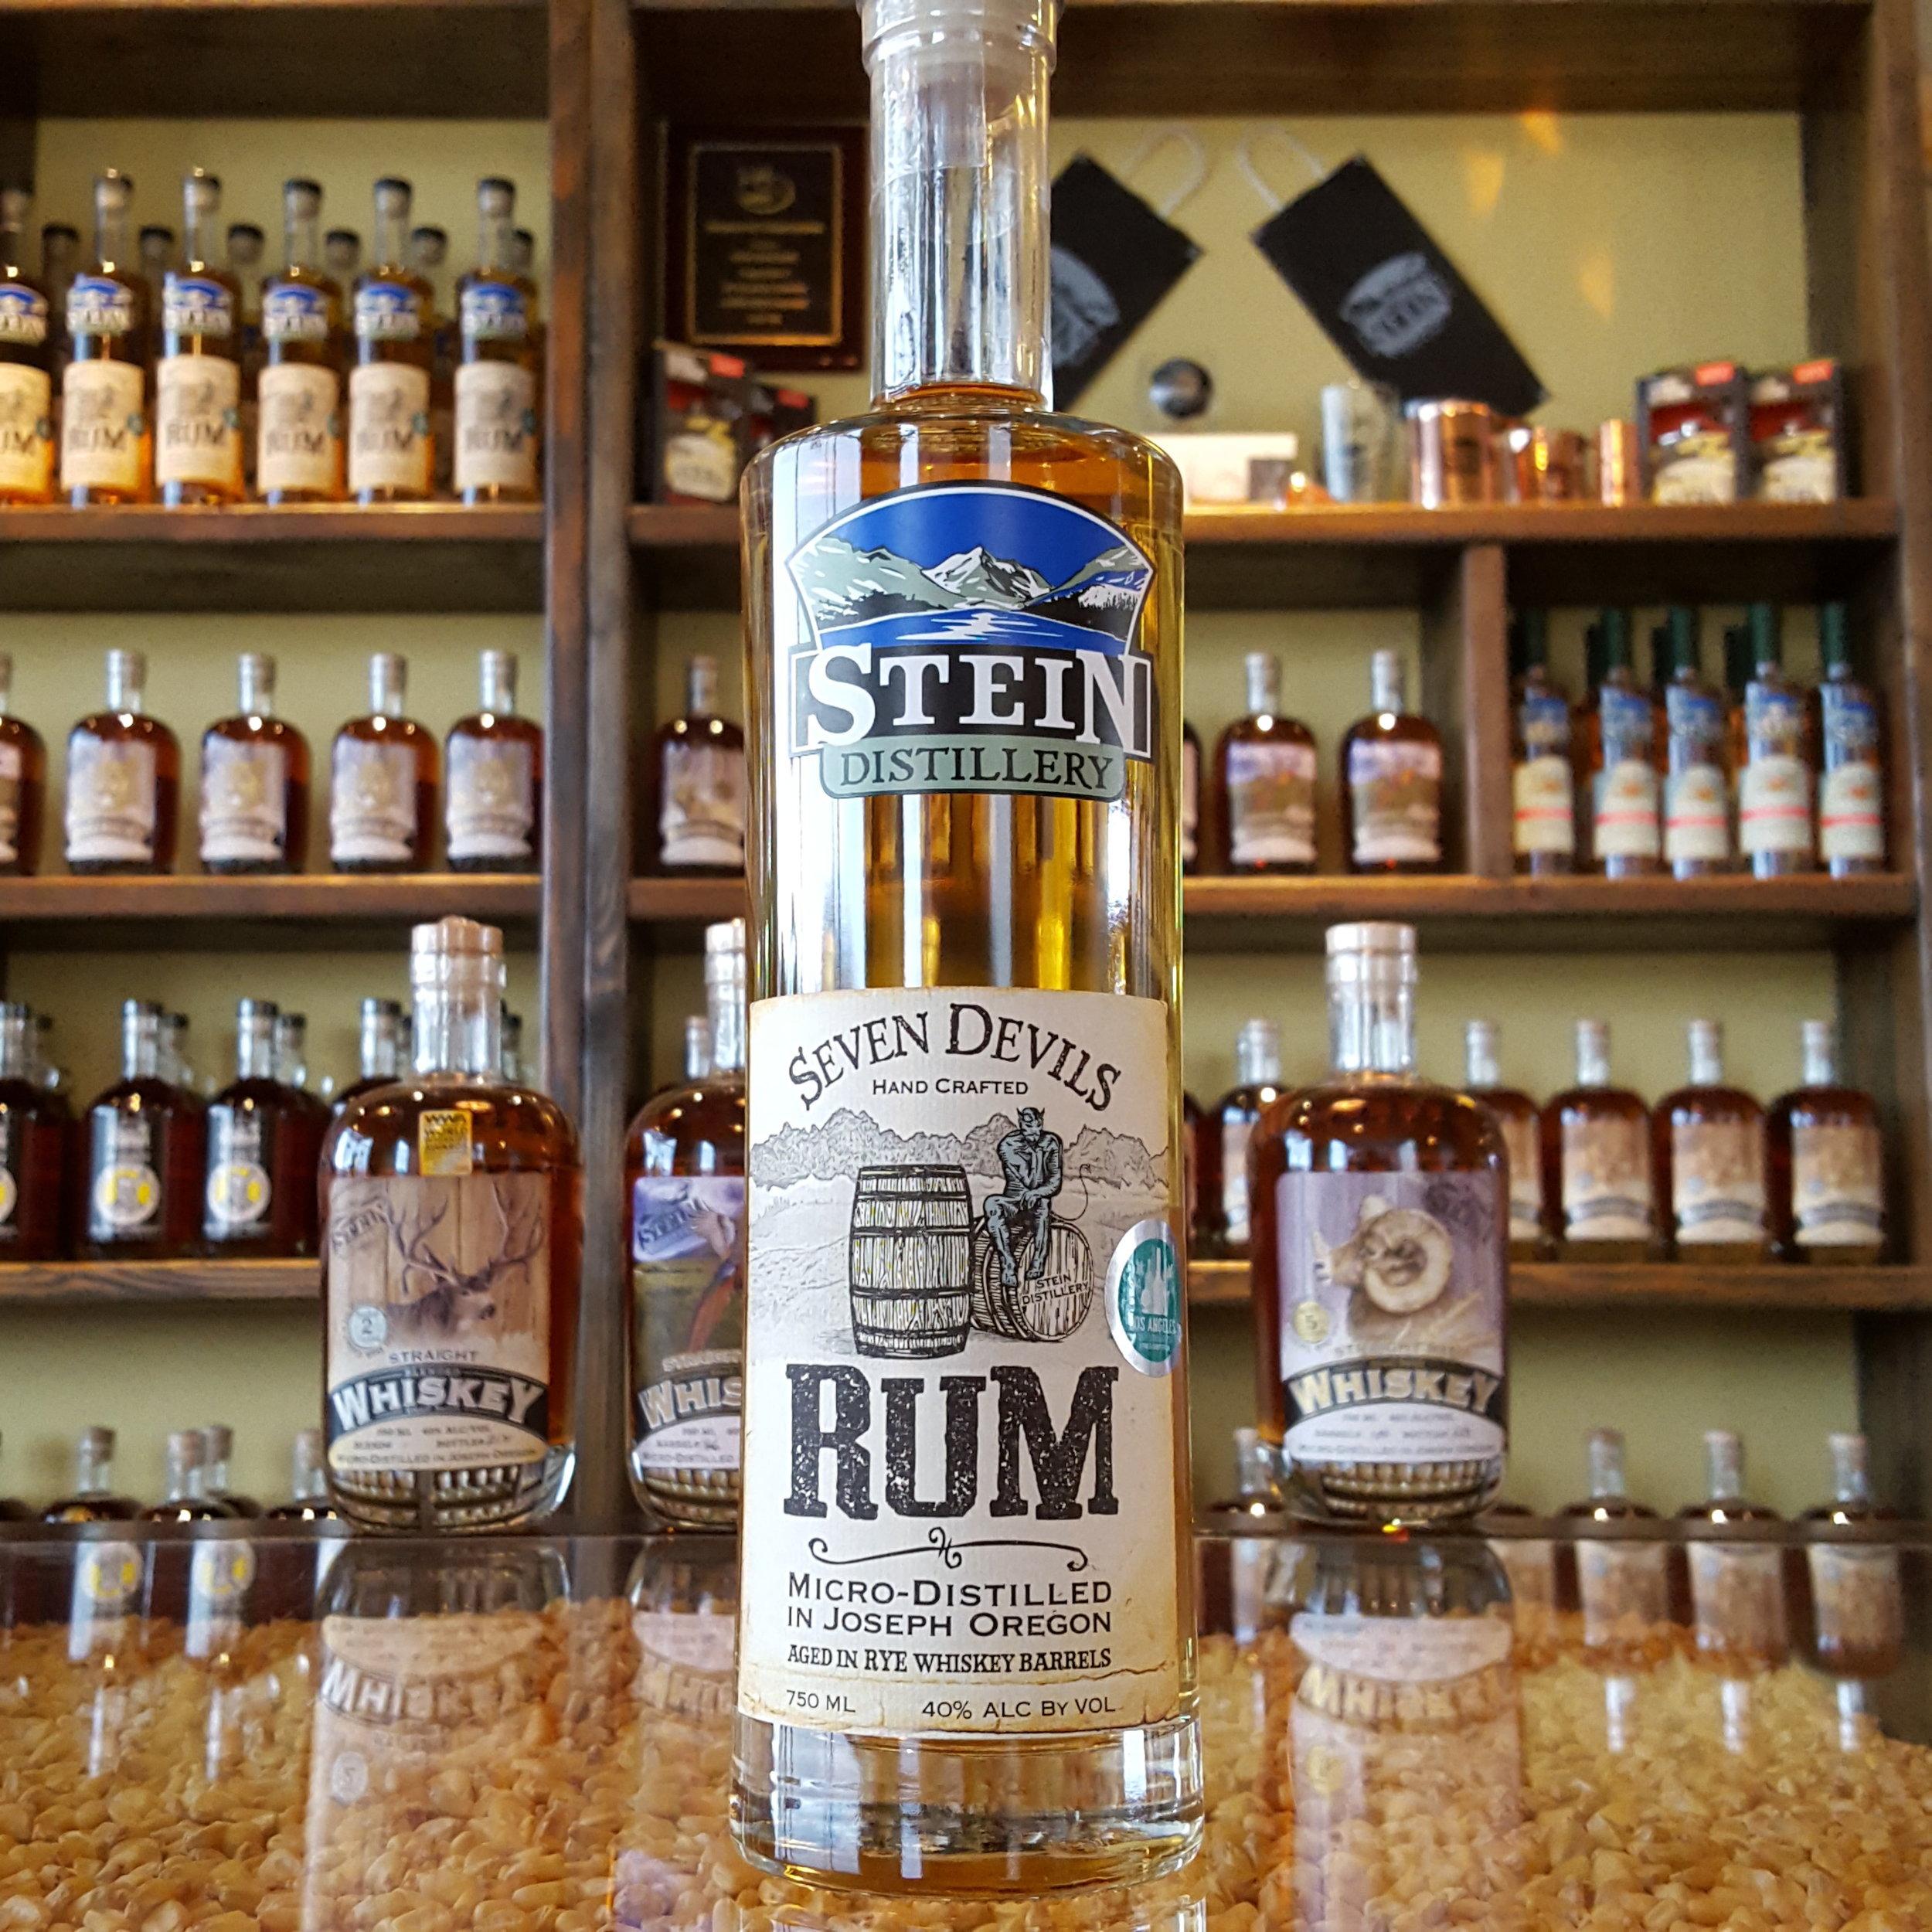 Seven Devils Rum Aged in Rye Whiskey Barrels - OLCC Code: 2015B